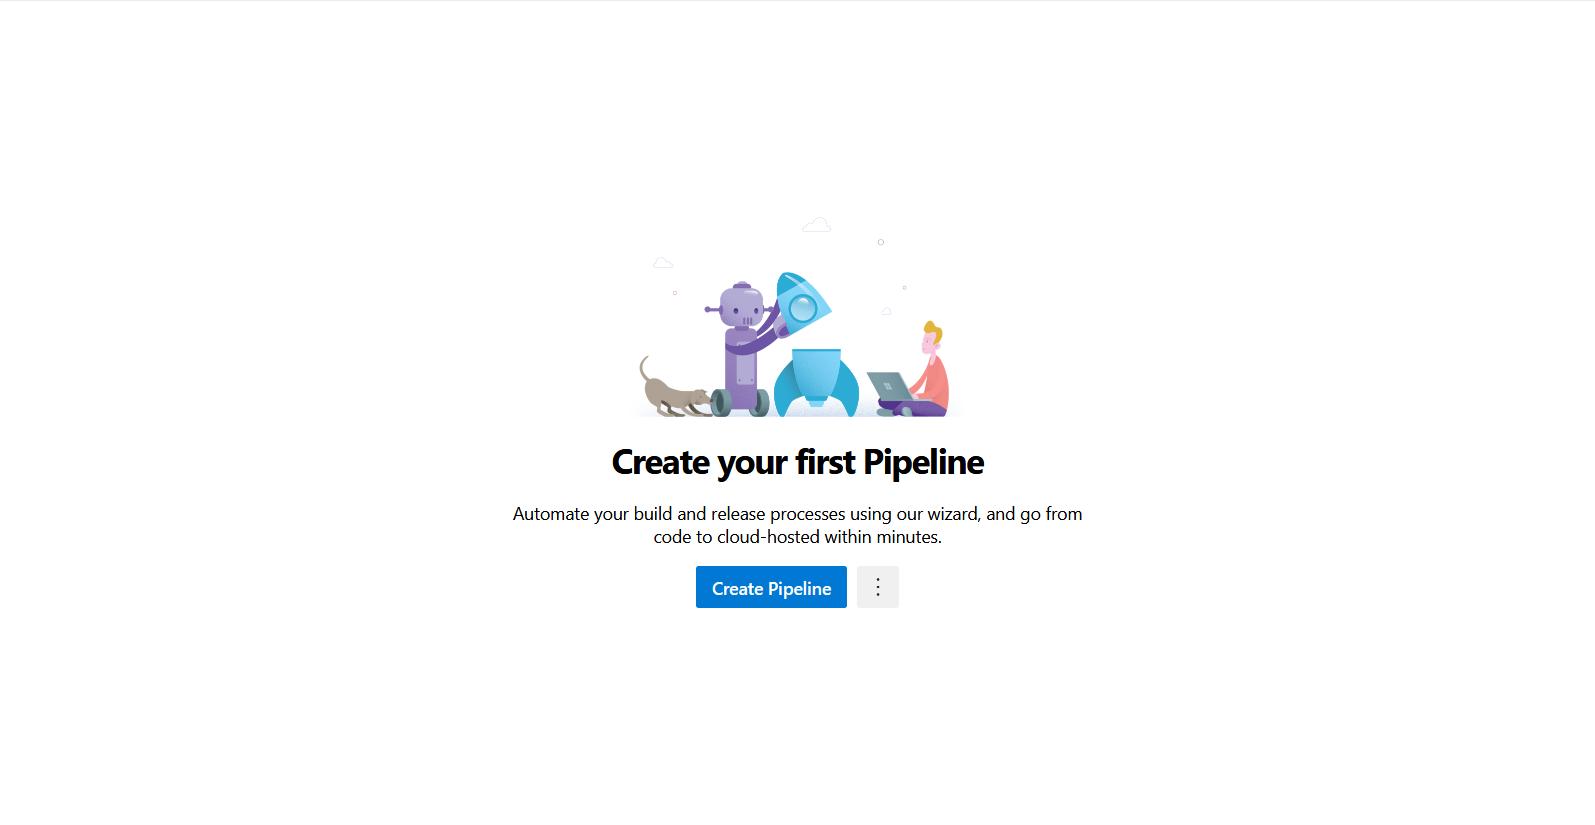 Create a Pipeline